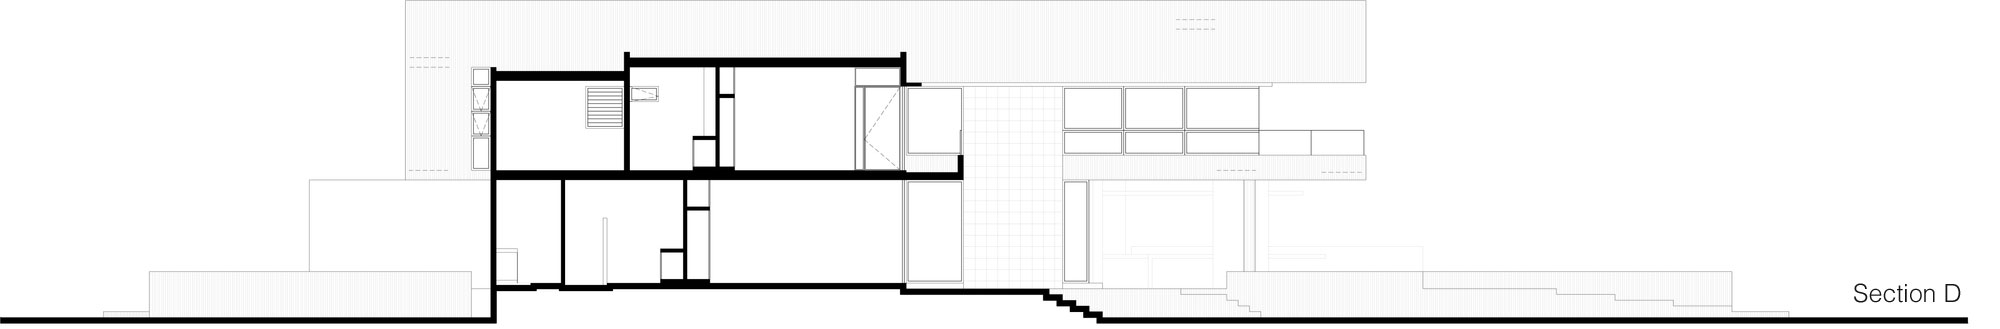 Tuunich Kanab by Seijo Peon Arquitectos (27)